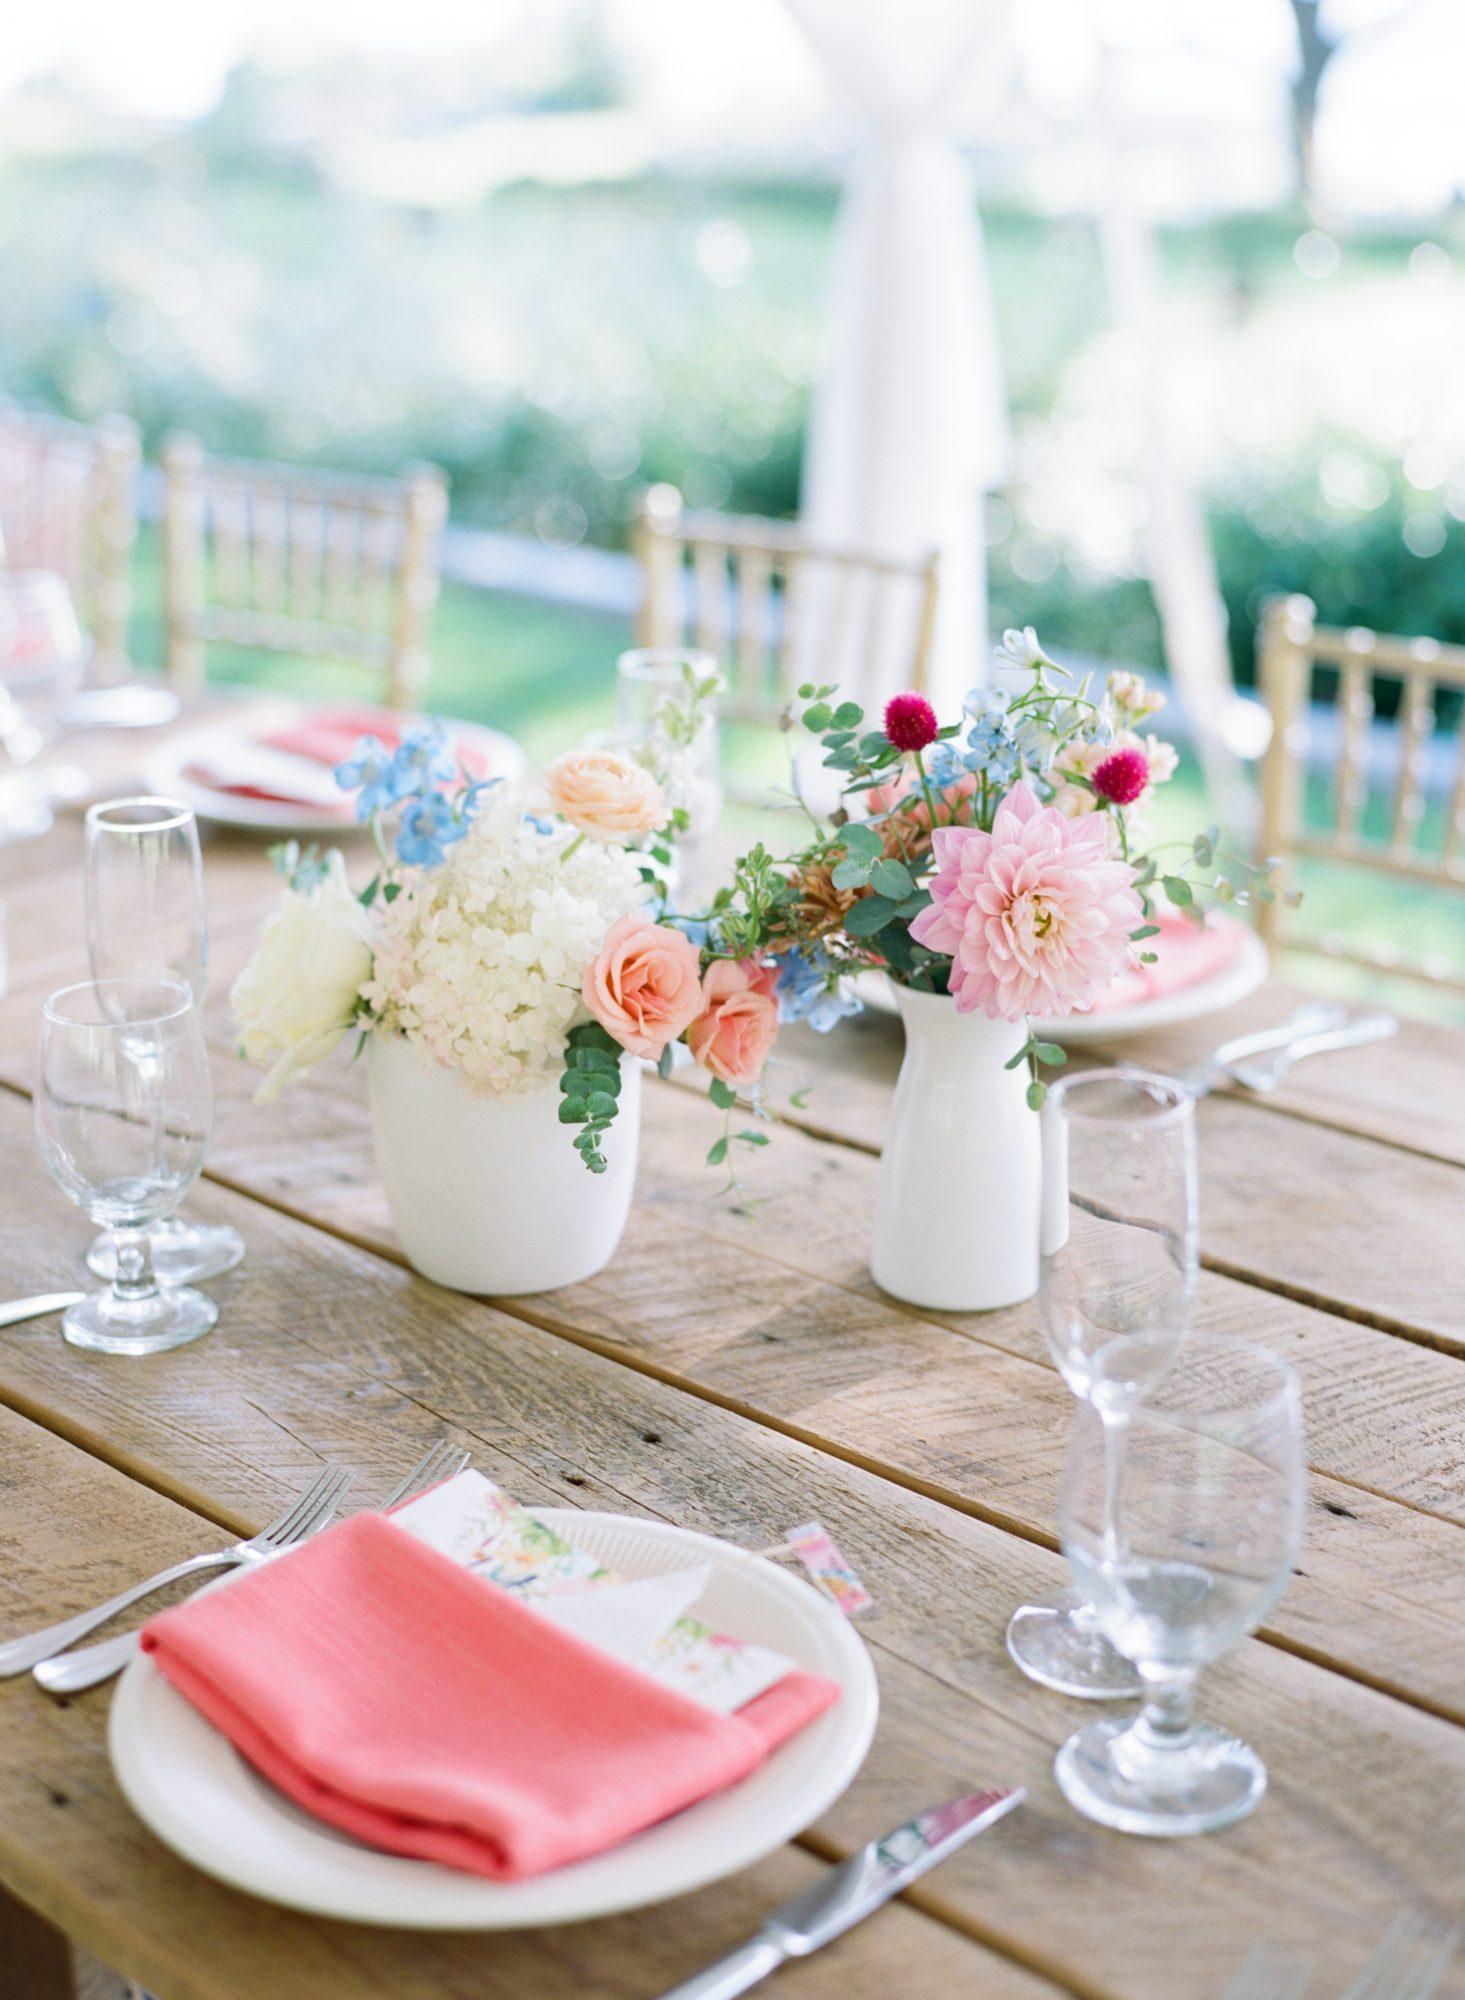 charlene jeremy wedding reception table centerpieces